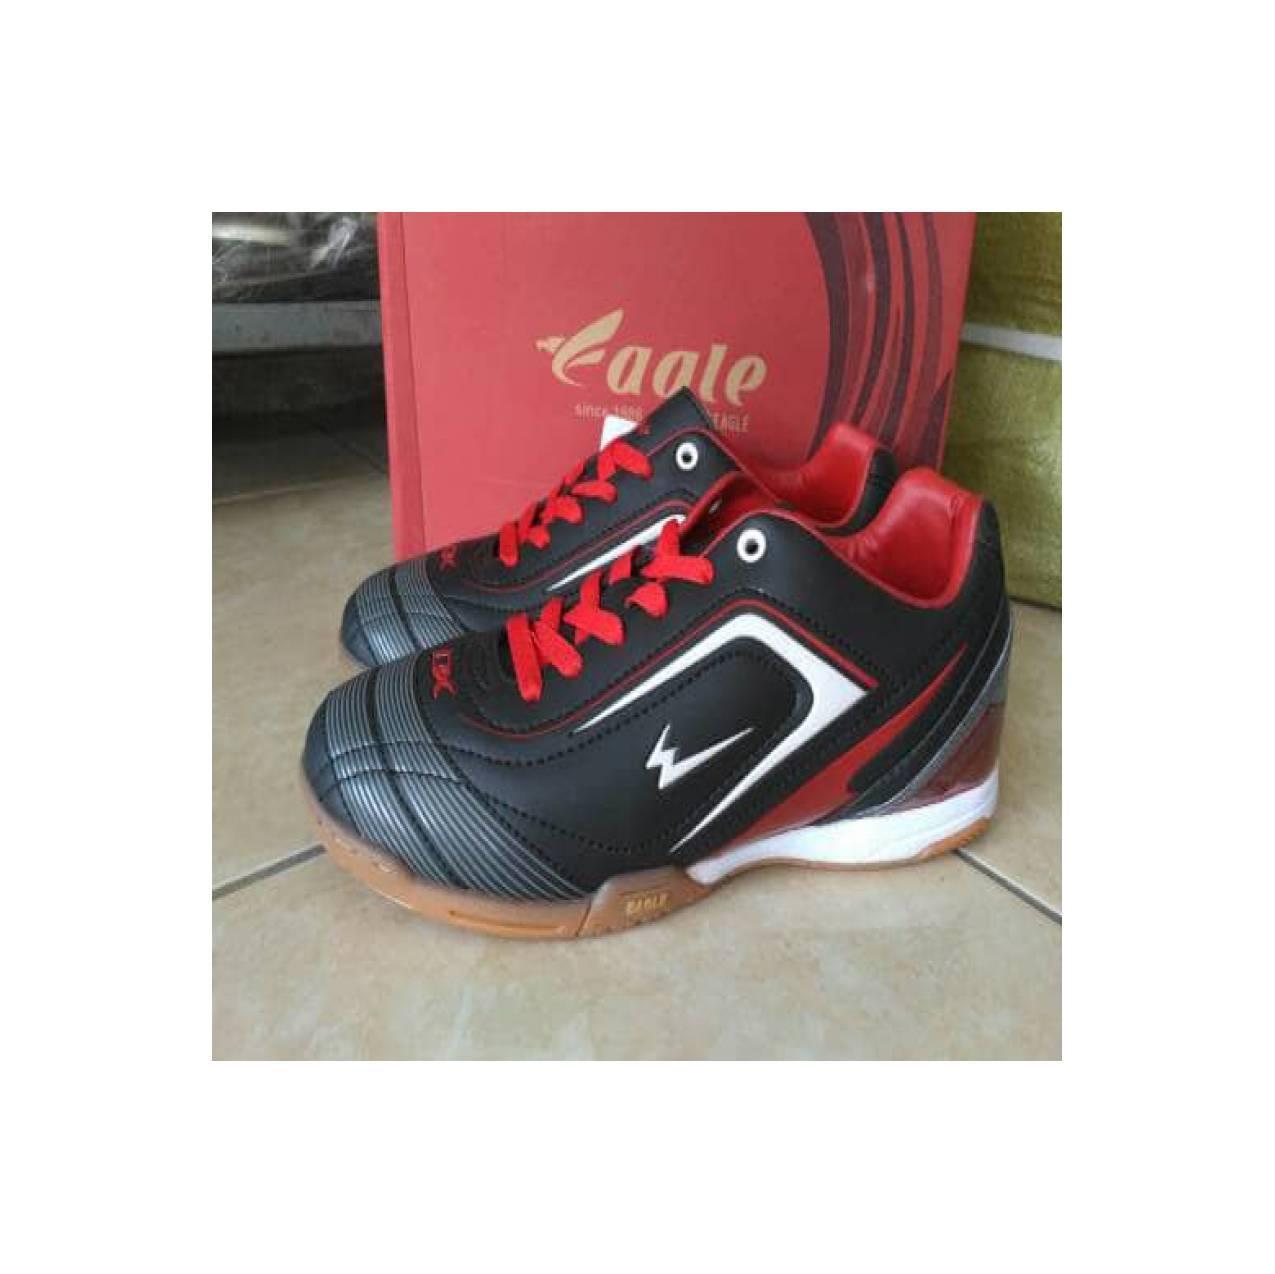 Sepatu futsal EAGLE new ventura black